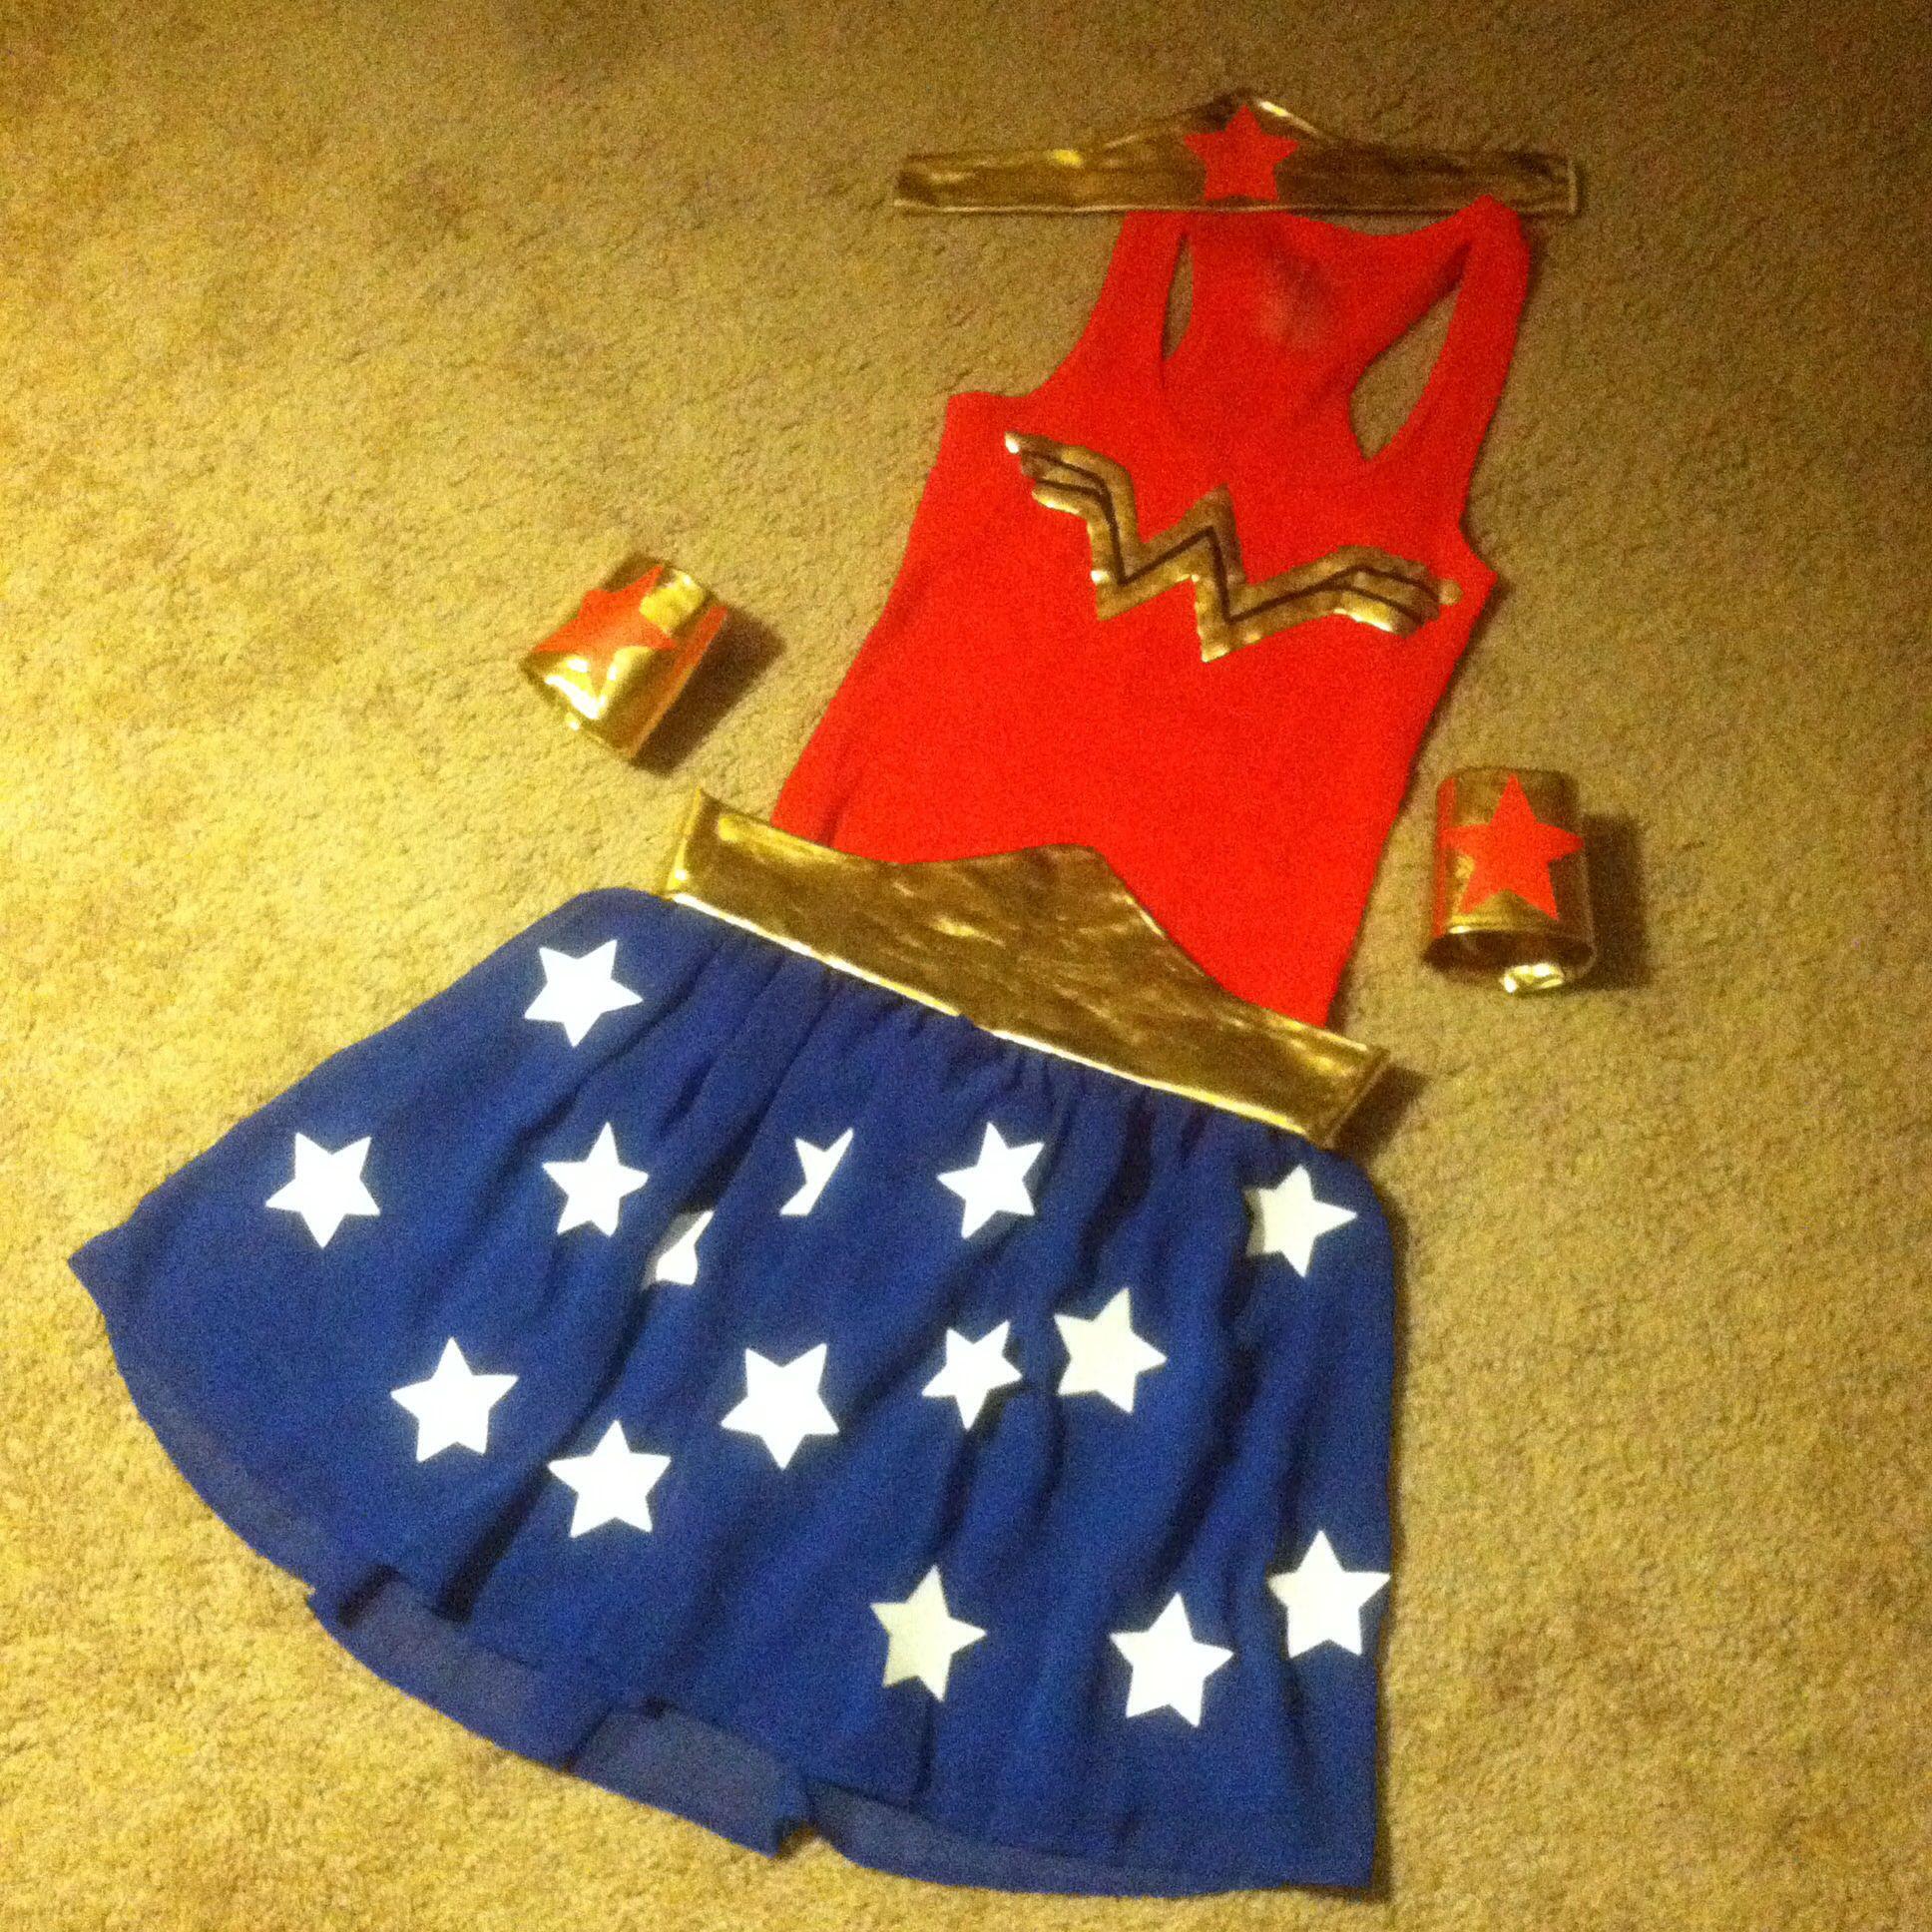 Diy wonder woman costume halloween wonderwoman easy for Easy diy women s halloween costumes